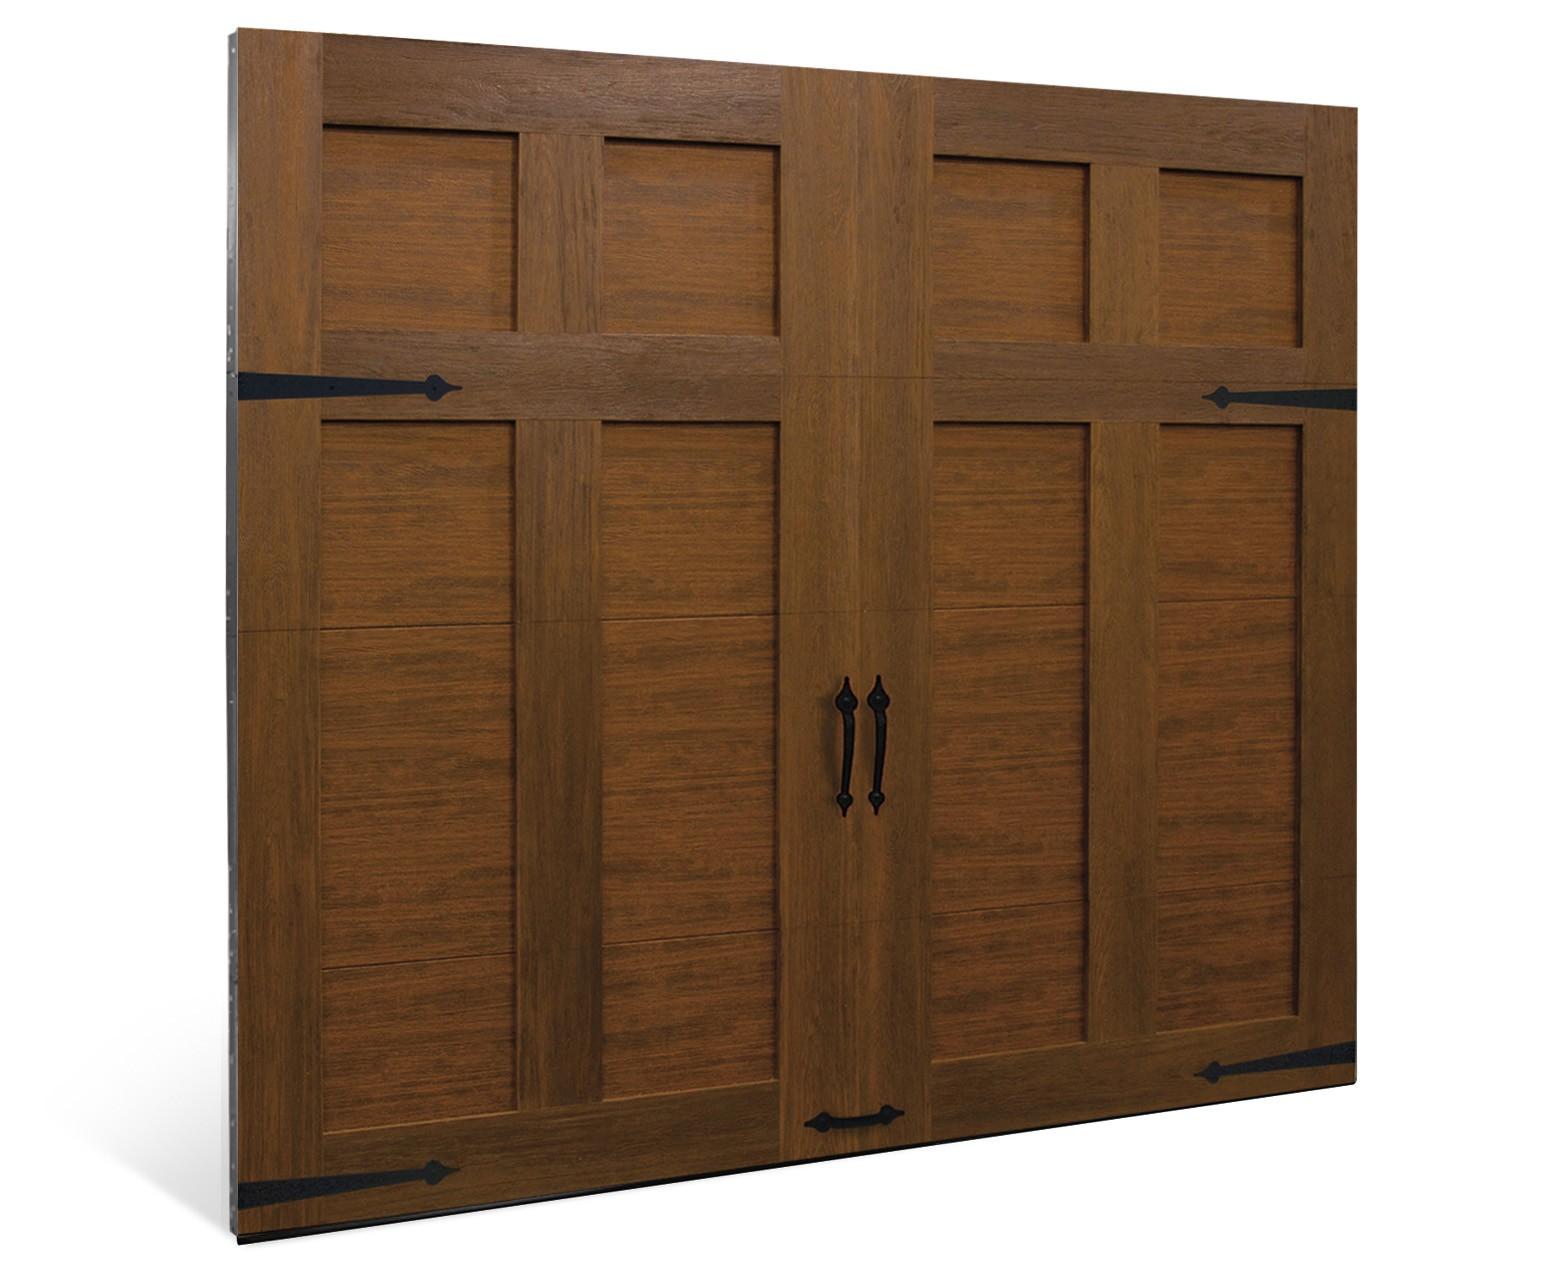 Canyon Ridge Ultra Grain Faux Wood Garage Door